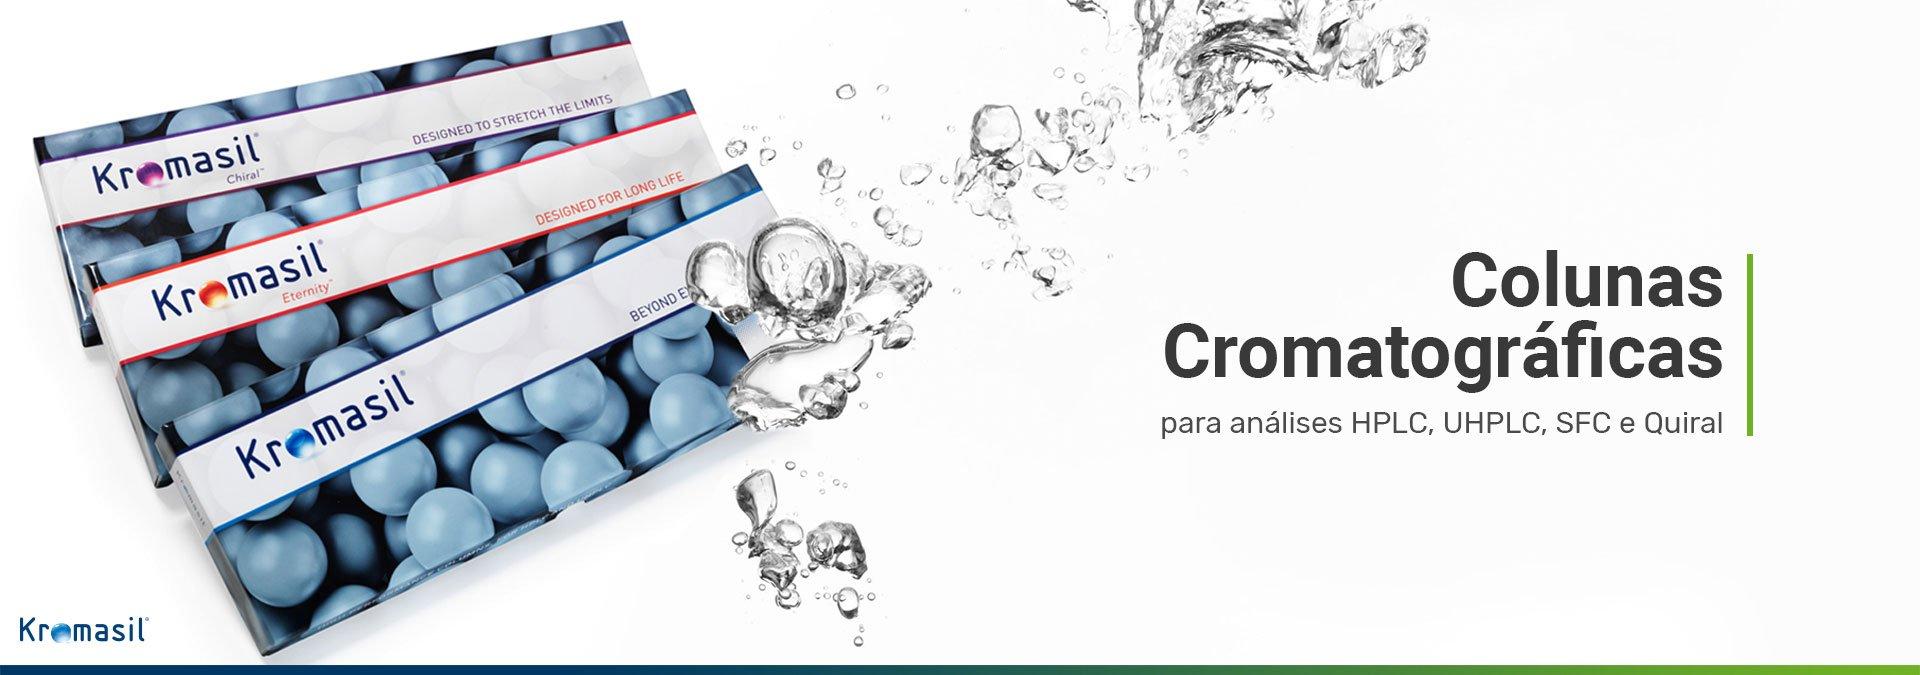 kromasil-fornecedor-cms-cientifica